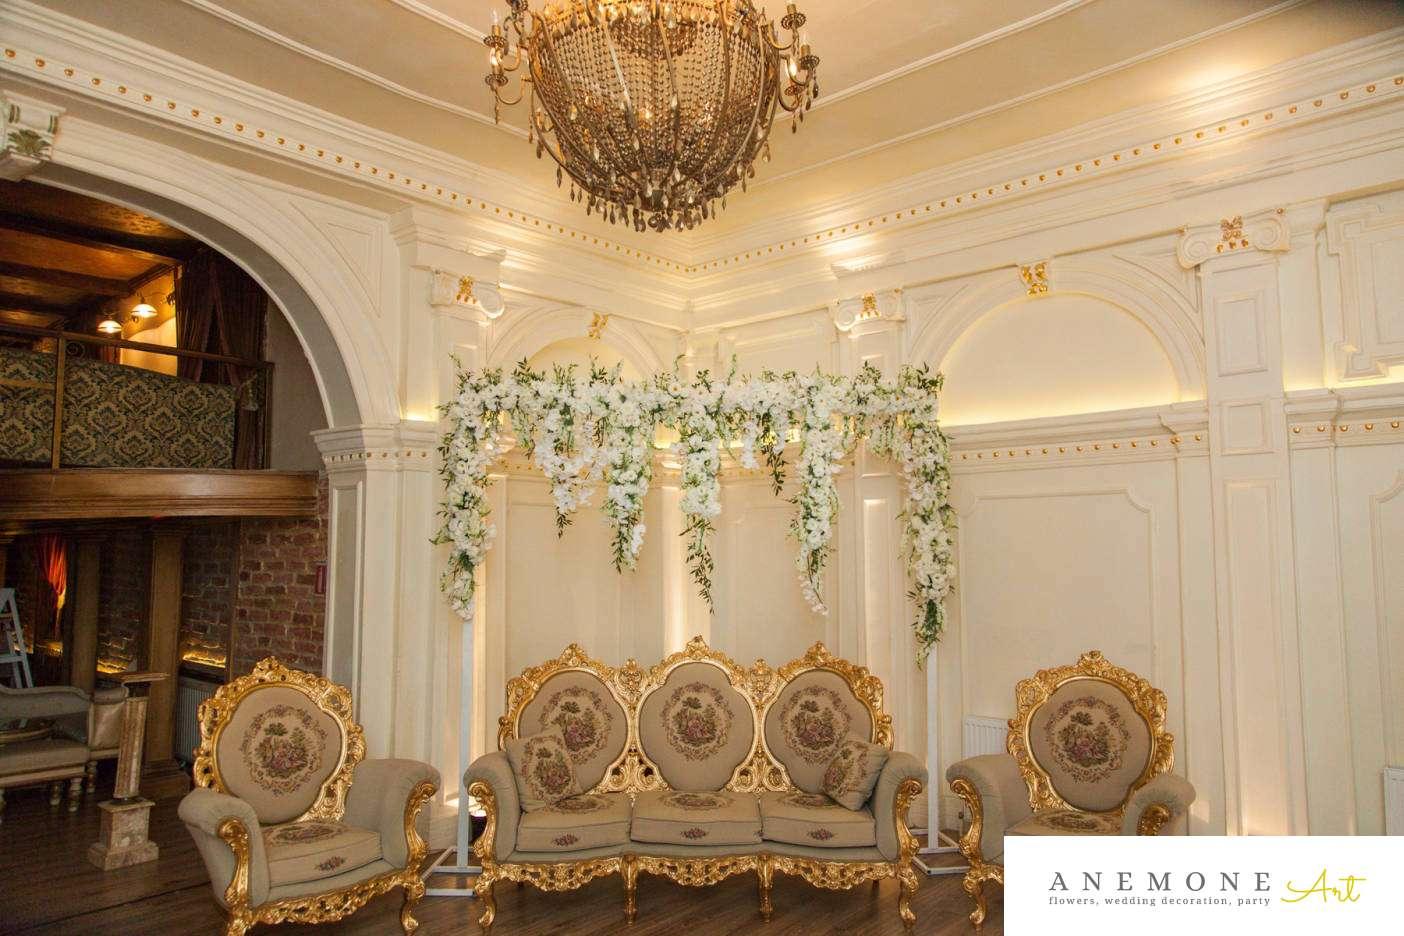 Poza, foto cu Flori de nunta alb, decor colt photo, vila carol in Arad, Timisoara, Oradea (wedding flowers, bouquets) nunta Arad, Timisoara, Oradea